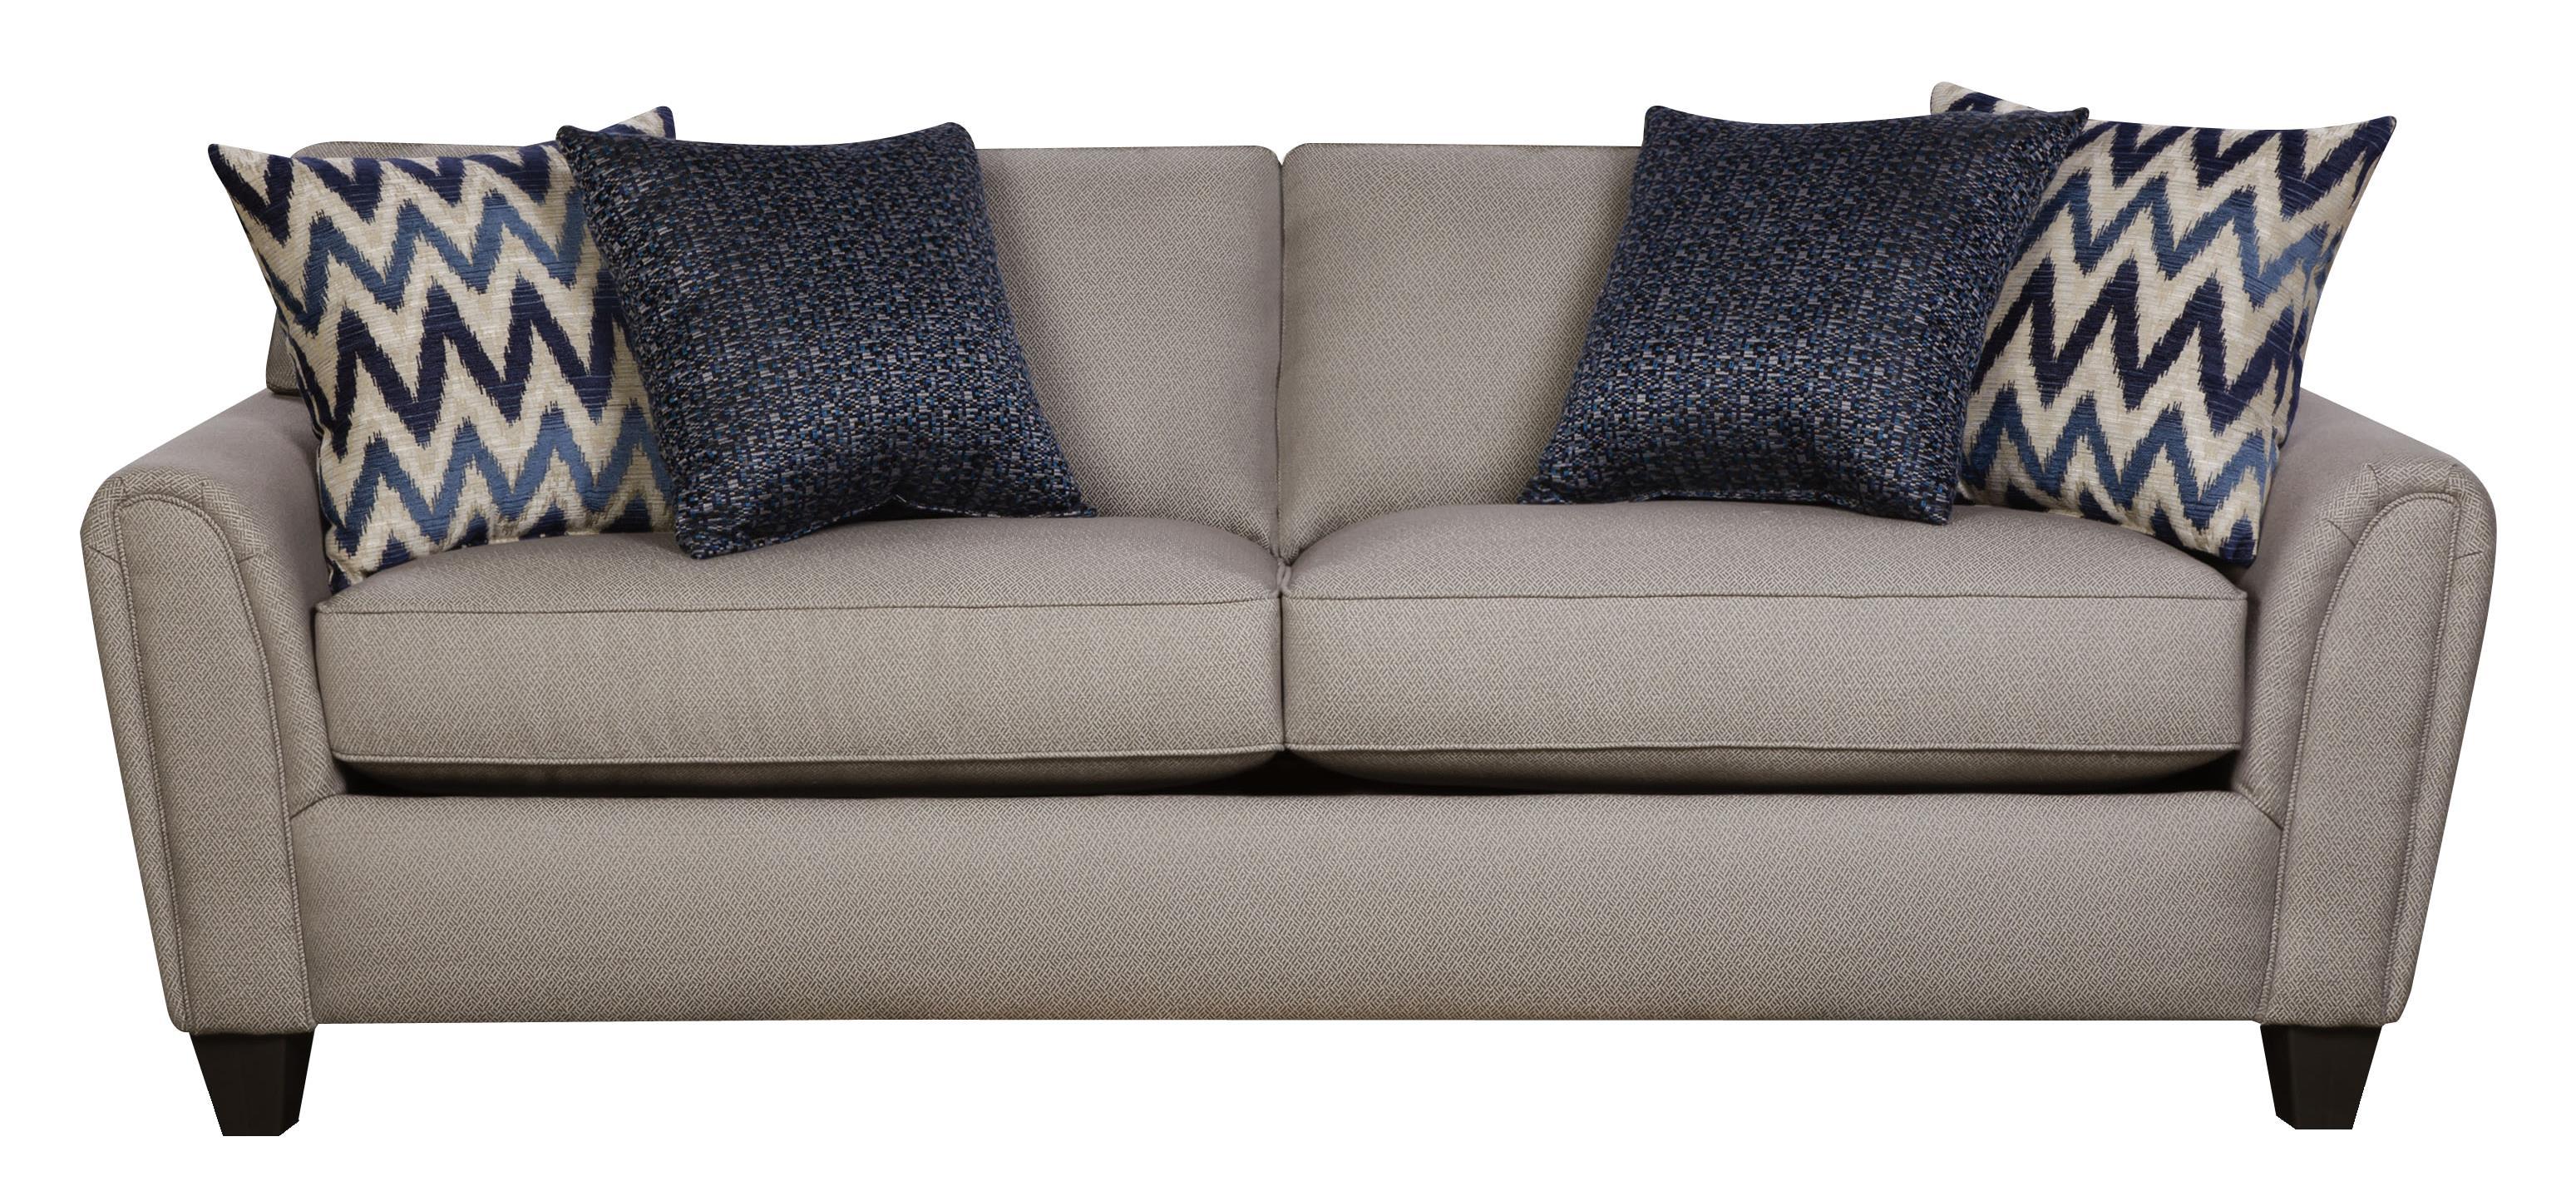 Corinthian 55A0 Casual Contemporary Sofa With Accent Pillows